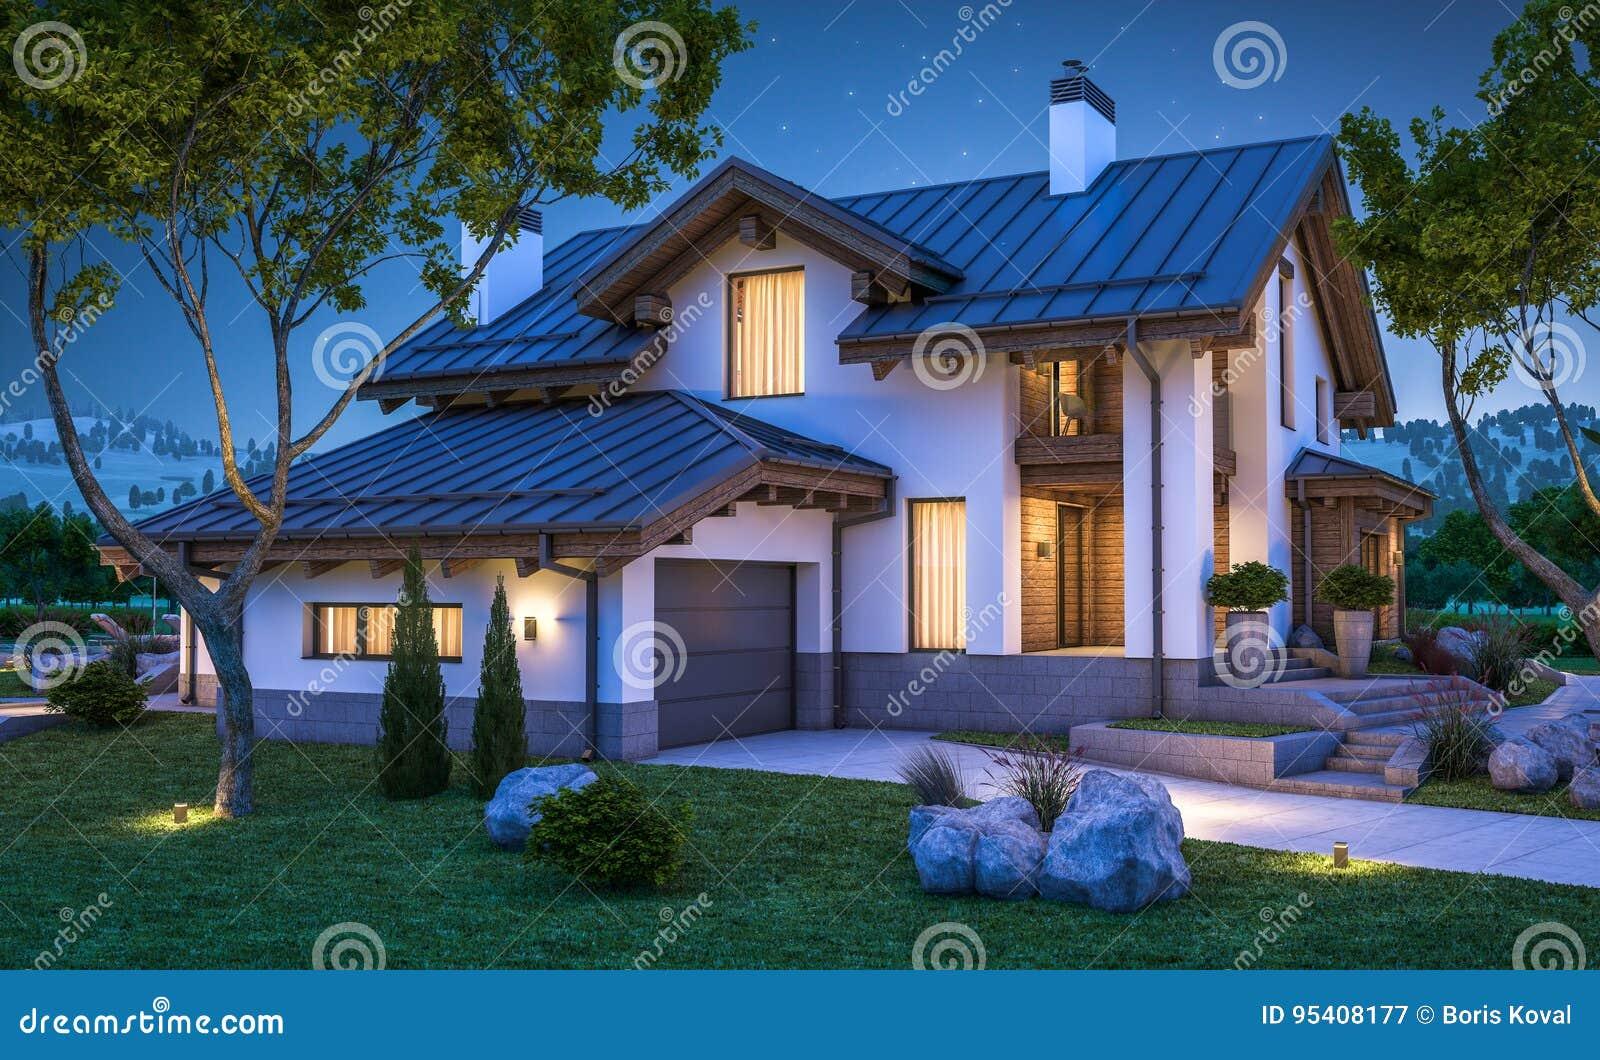 3d rendering of modern cozy house in chalet style stock illustration image 95408177 - Moderner chalet stil ...